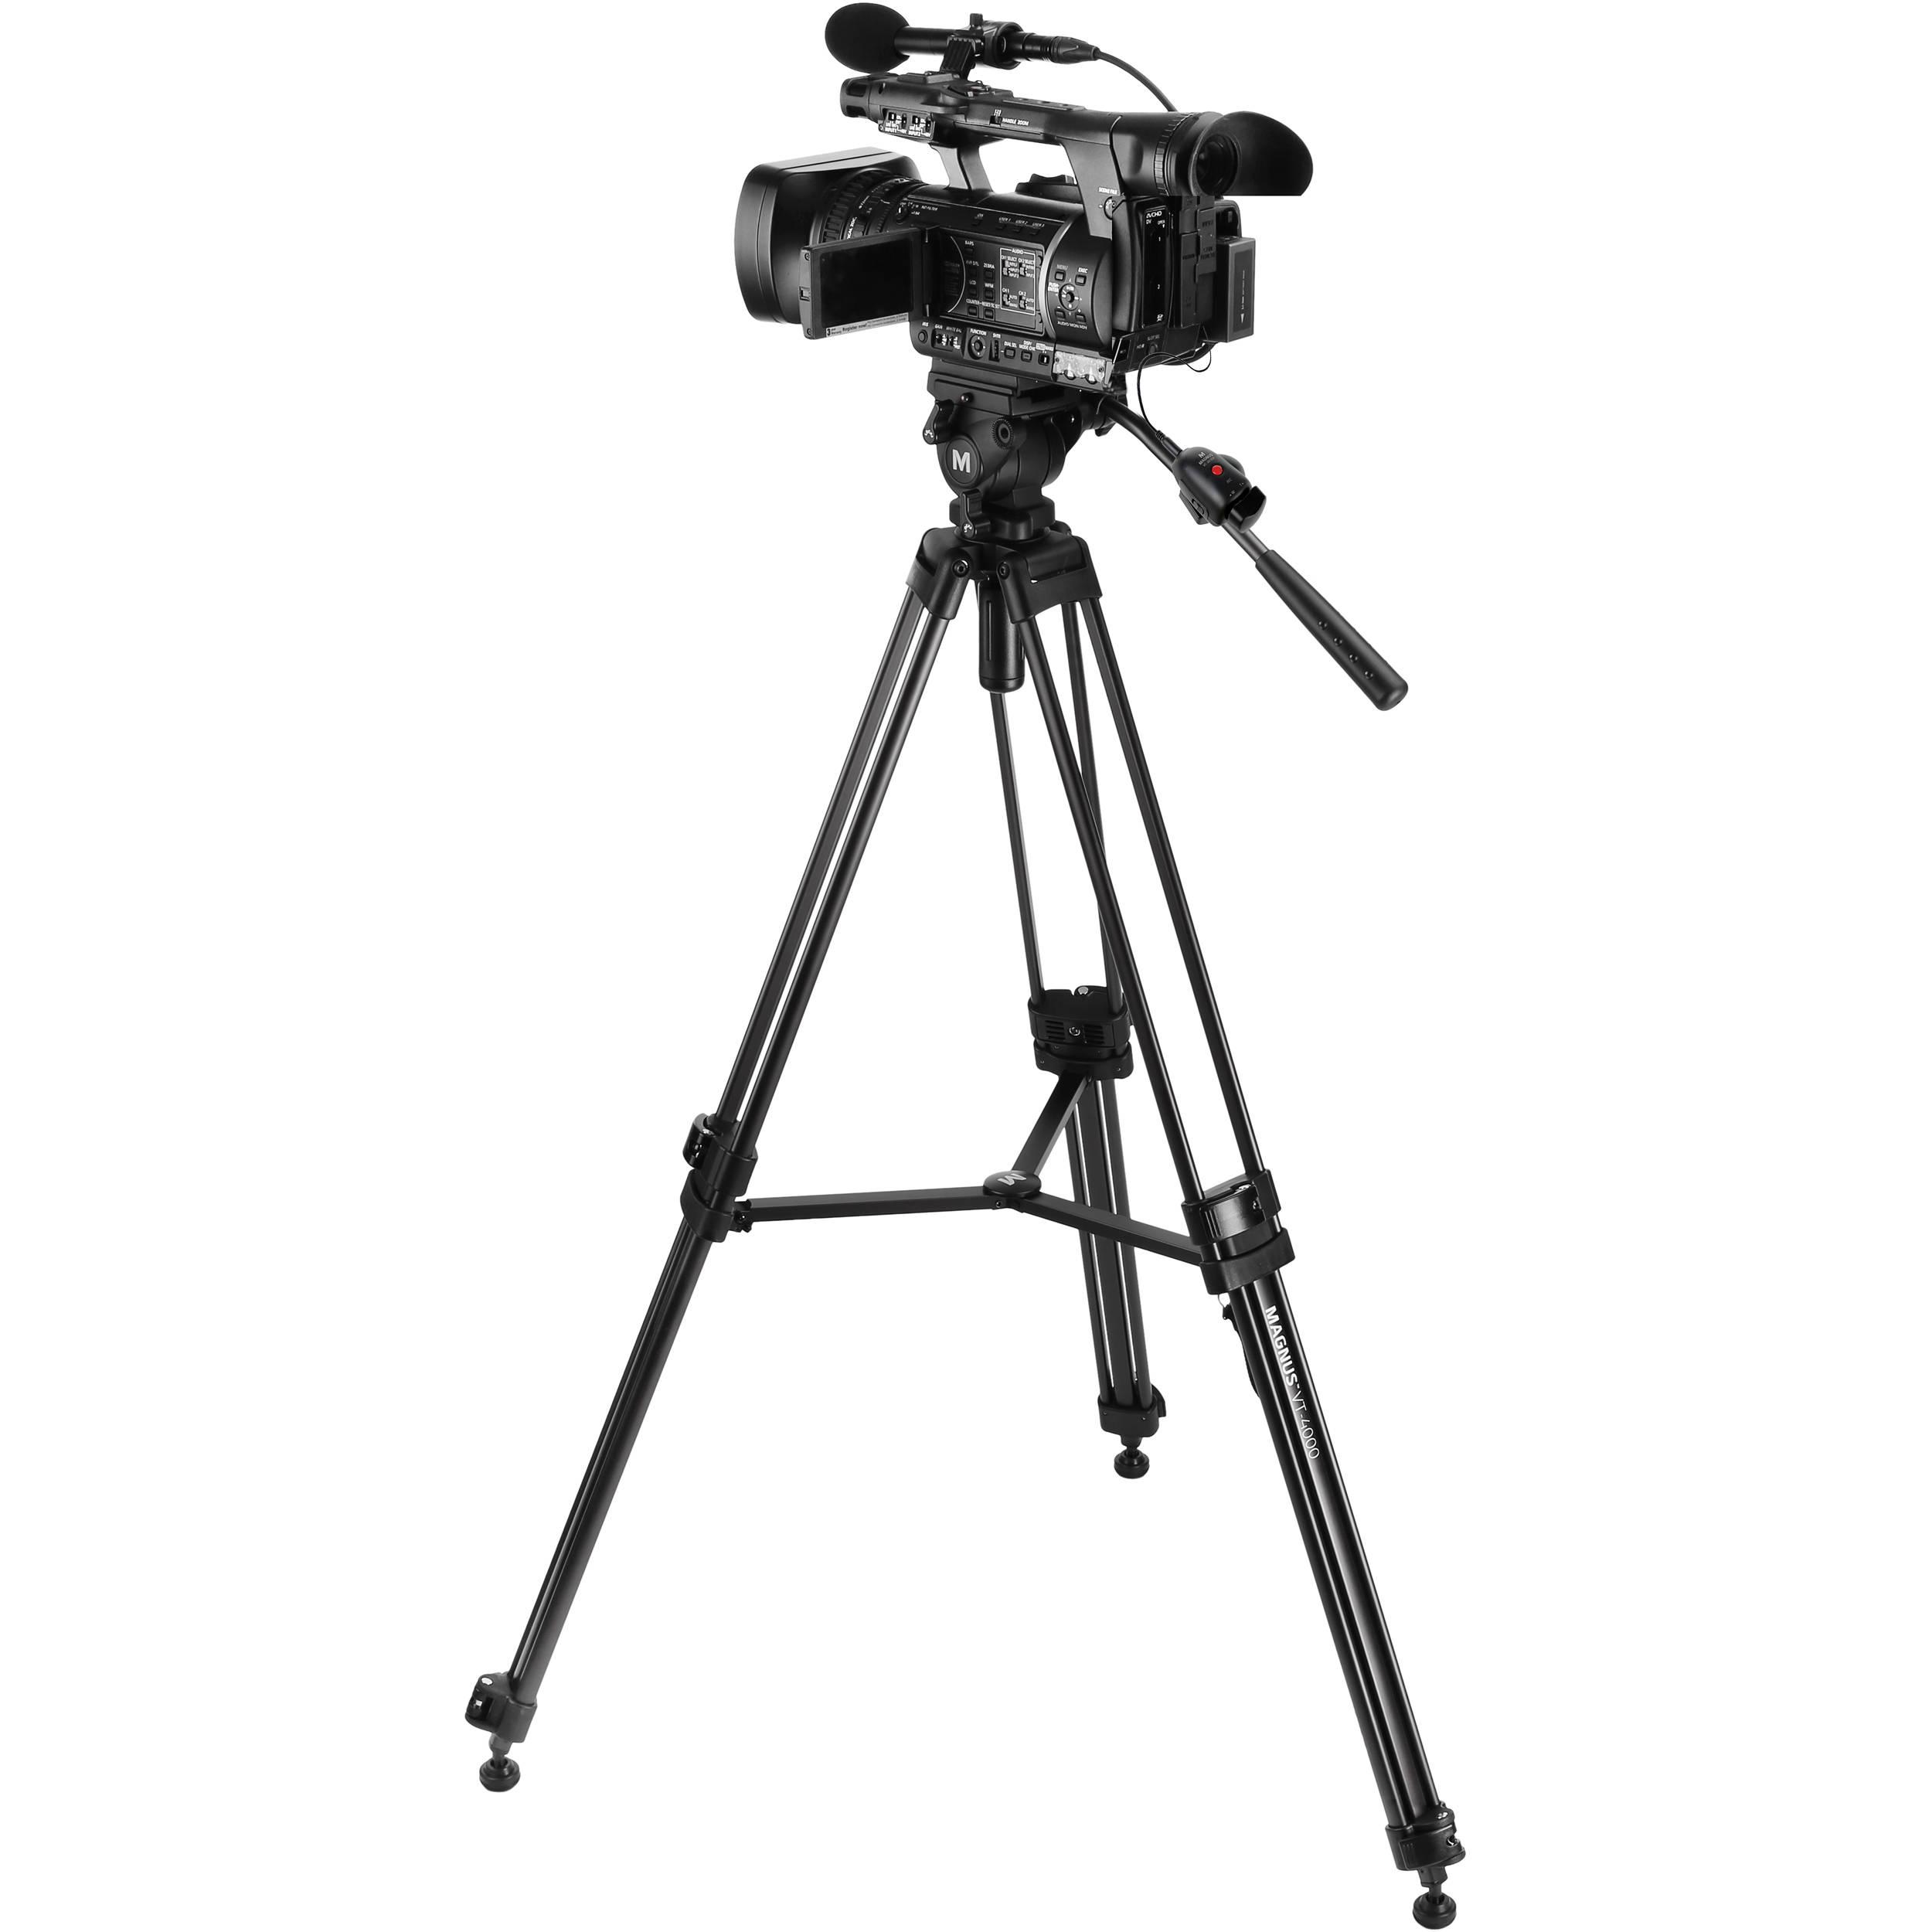 Magnus VT-4000 Tripod & Zoom Controller Kit VT-4000-K1 B&H